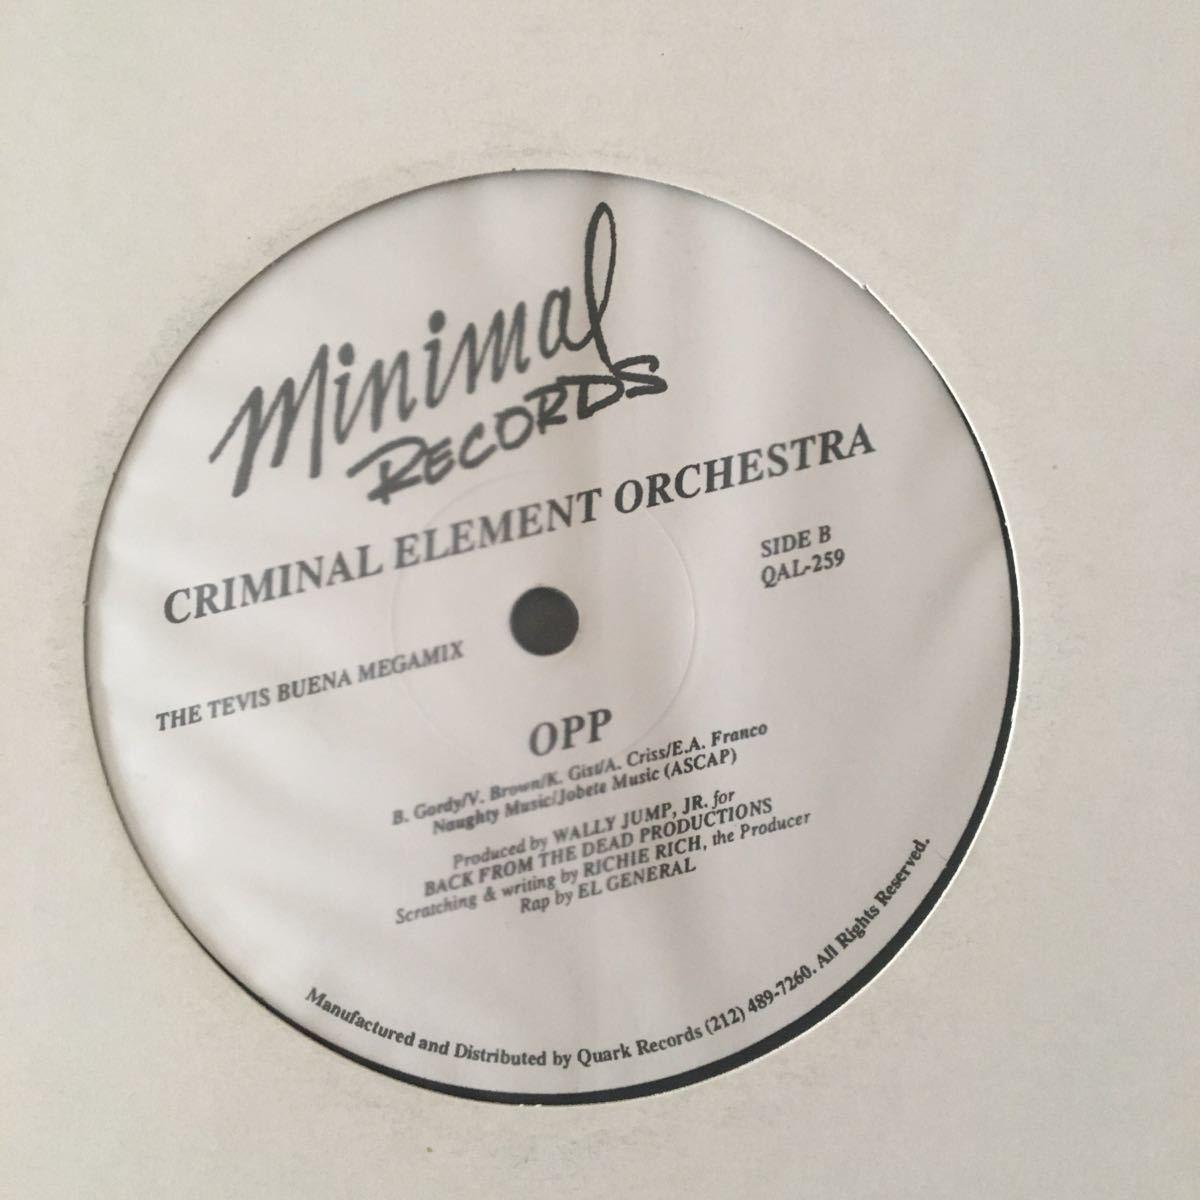 Criminal Element Orchestra ABC / OPP レコード